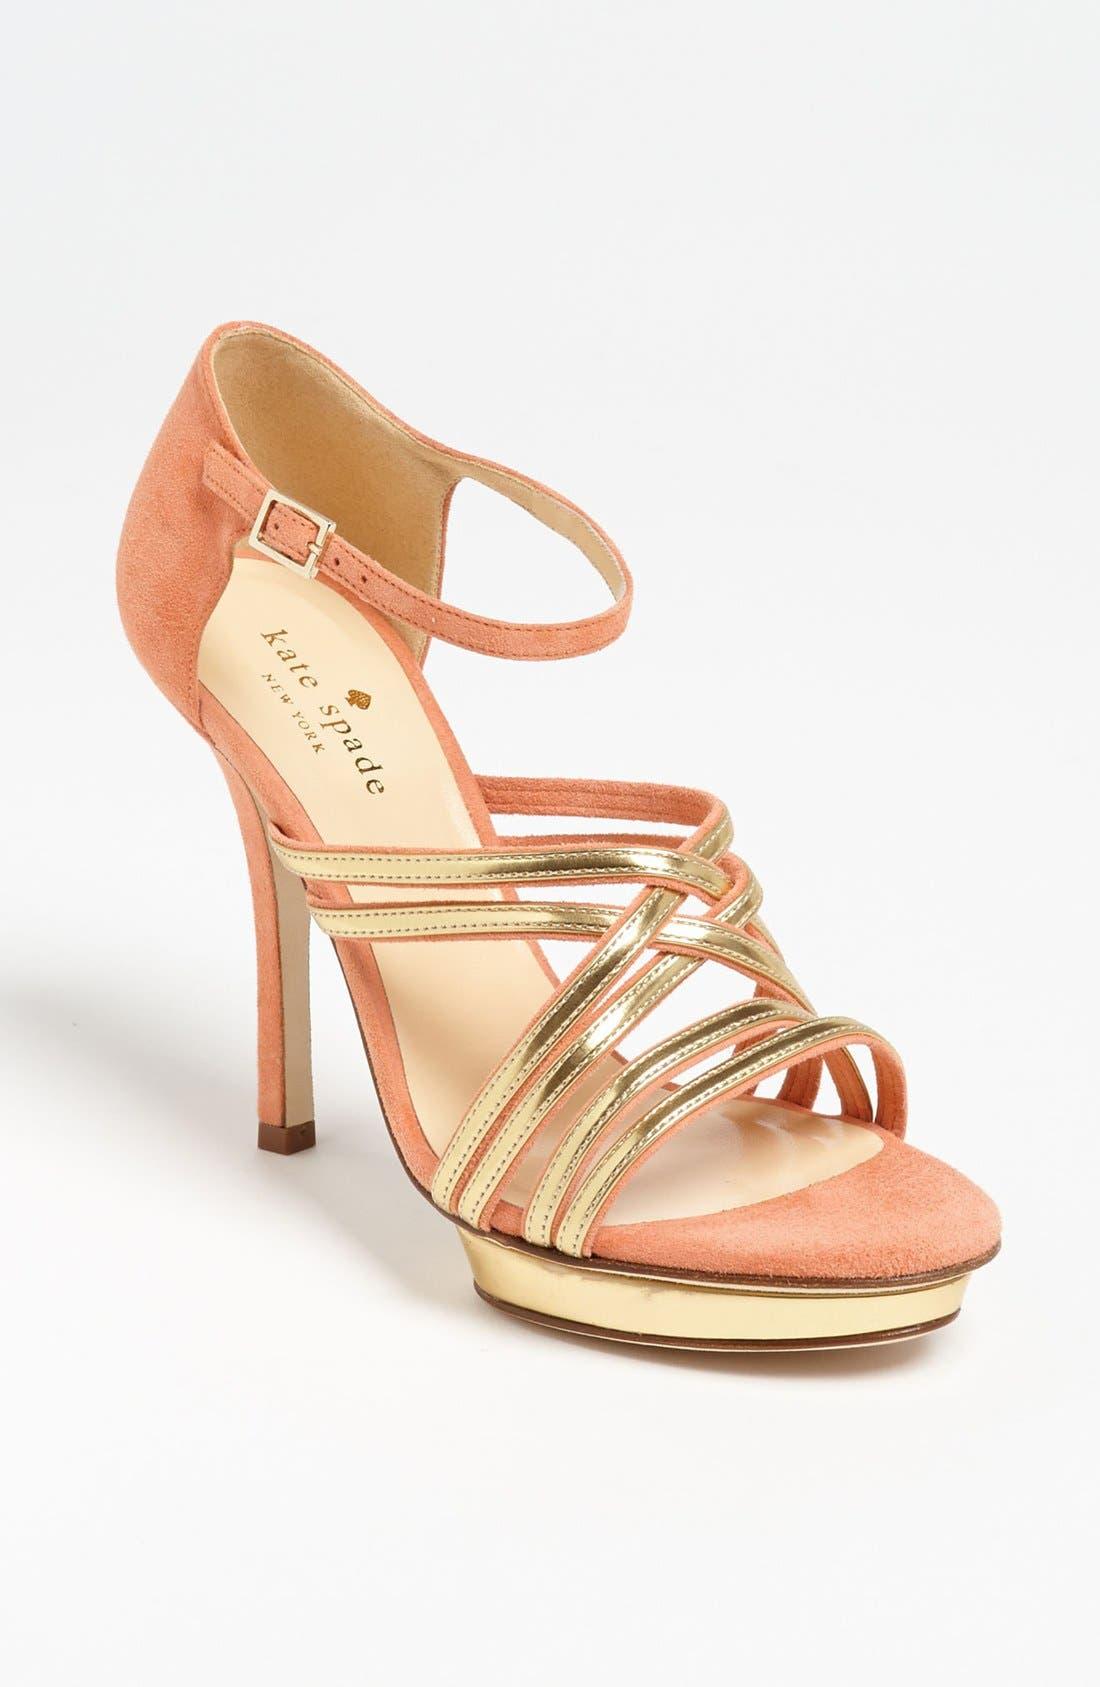 Alternate Image 1 Selected - kate spade new york 'vanity' sandal